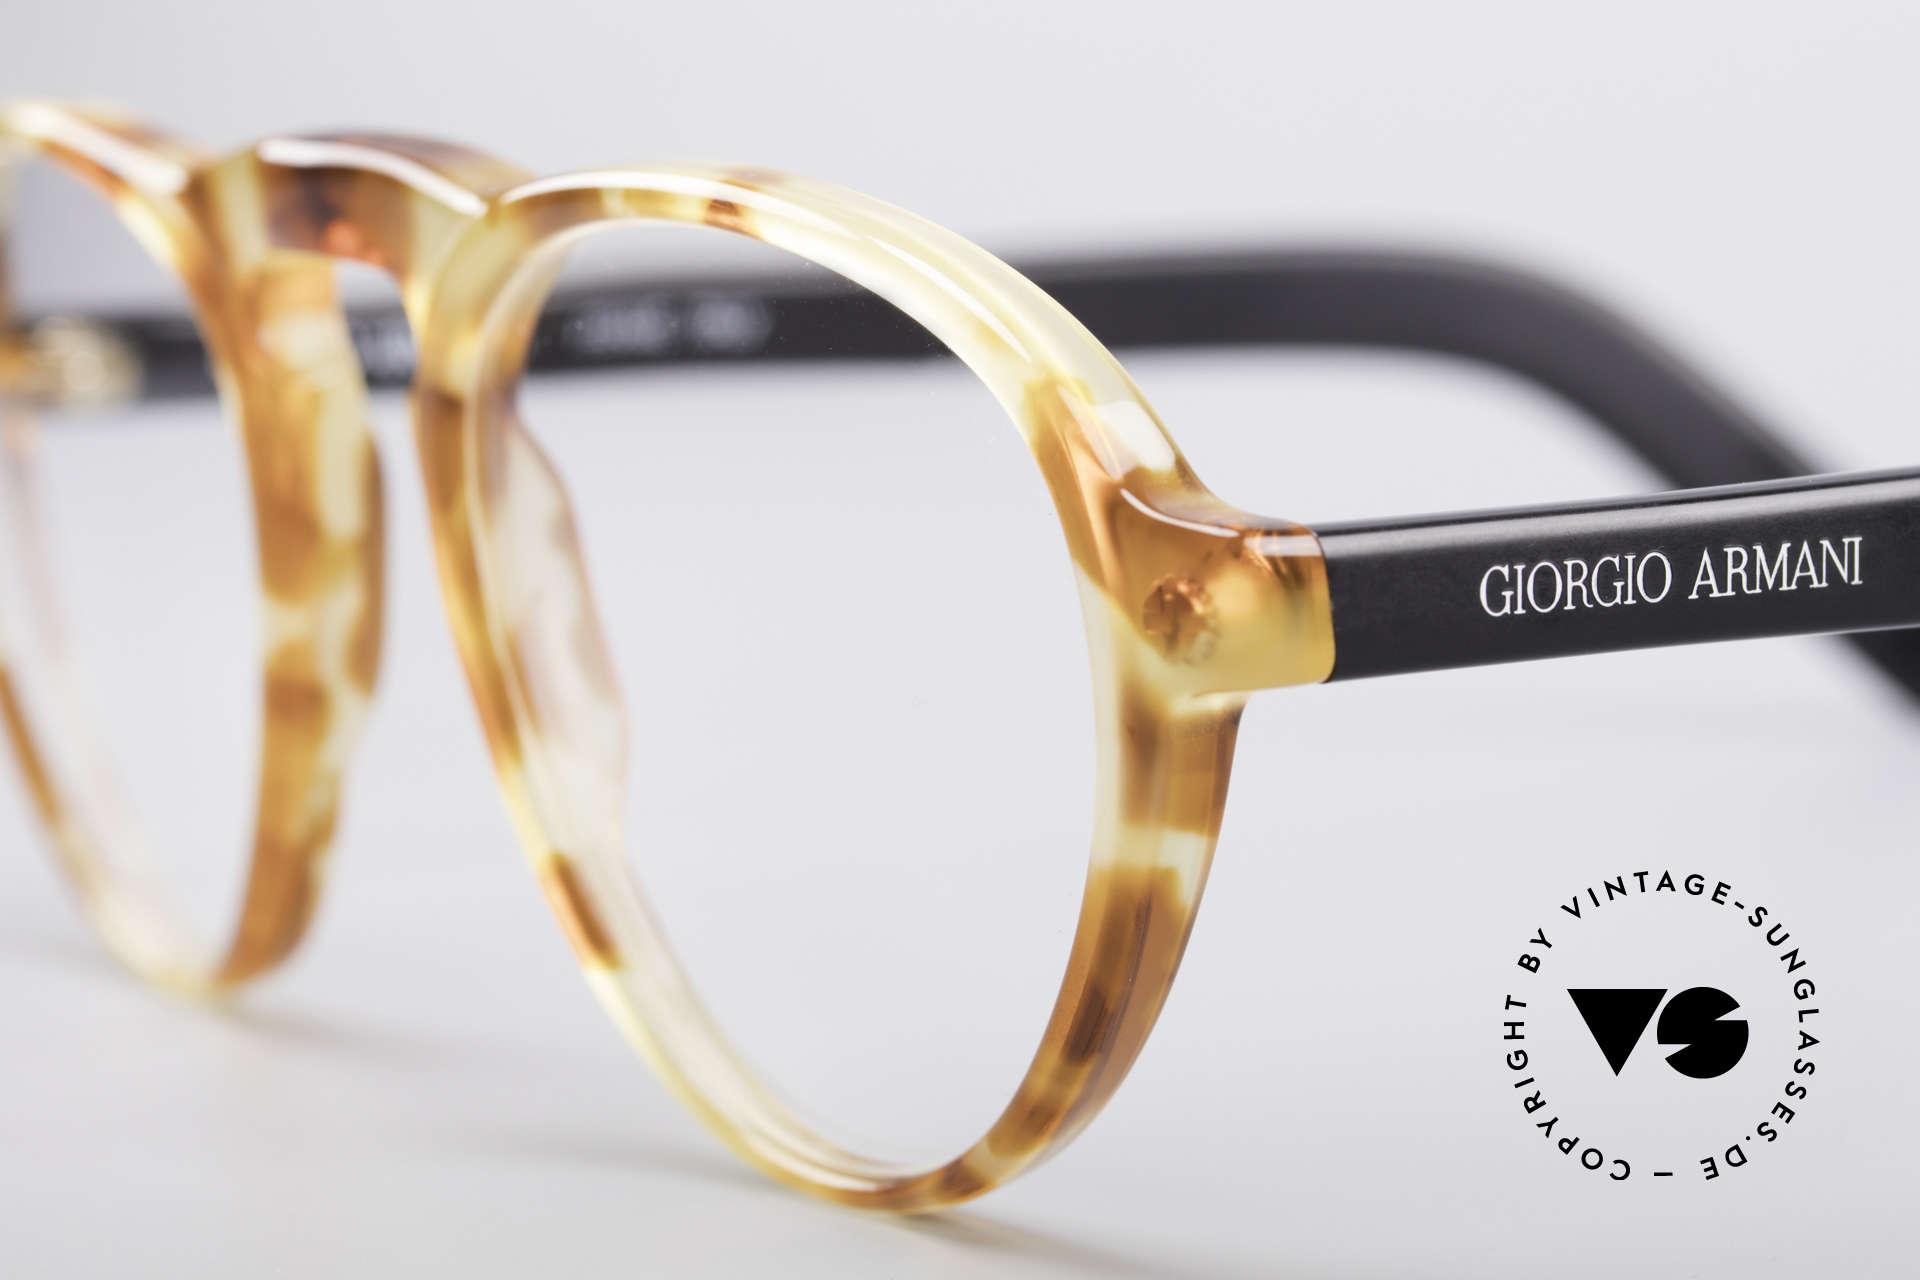 Giorgio Armani 315 True Vintage Eyeglass Frame, frame is made for lenses of any kind (optical/sun), Made for Men